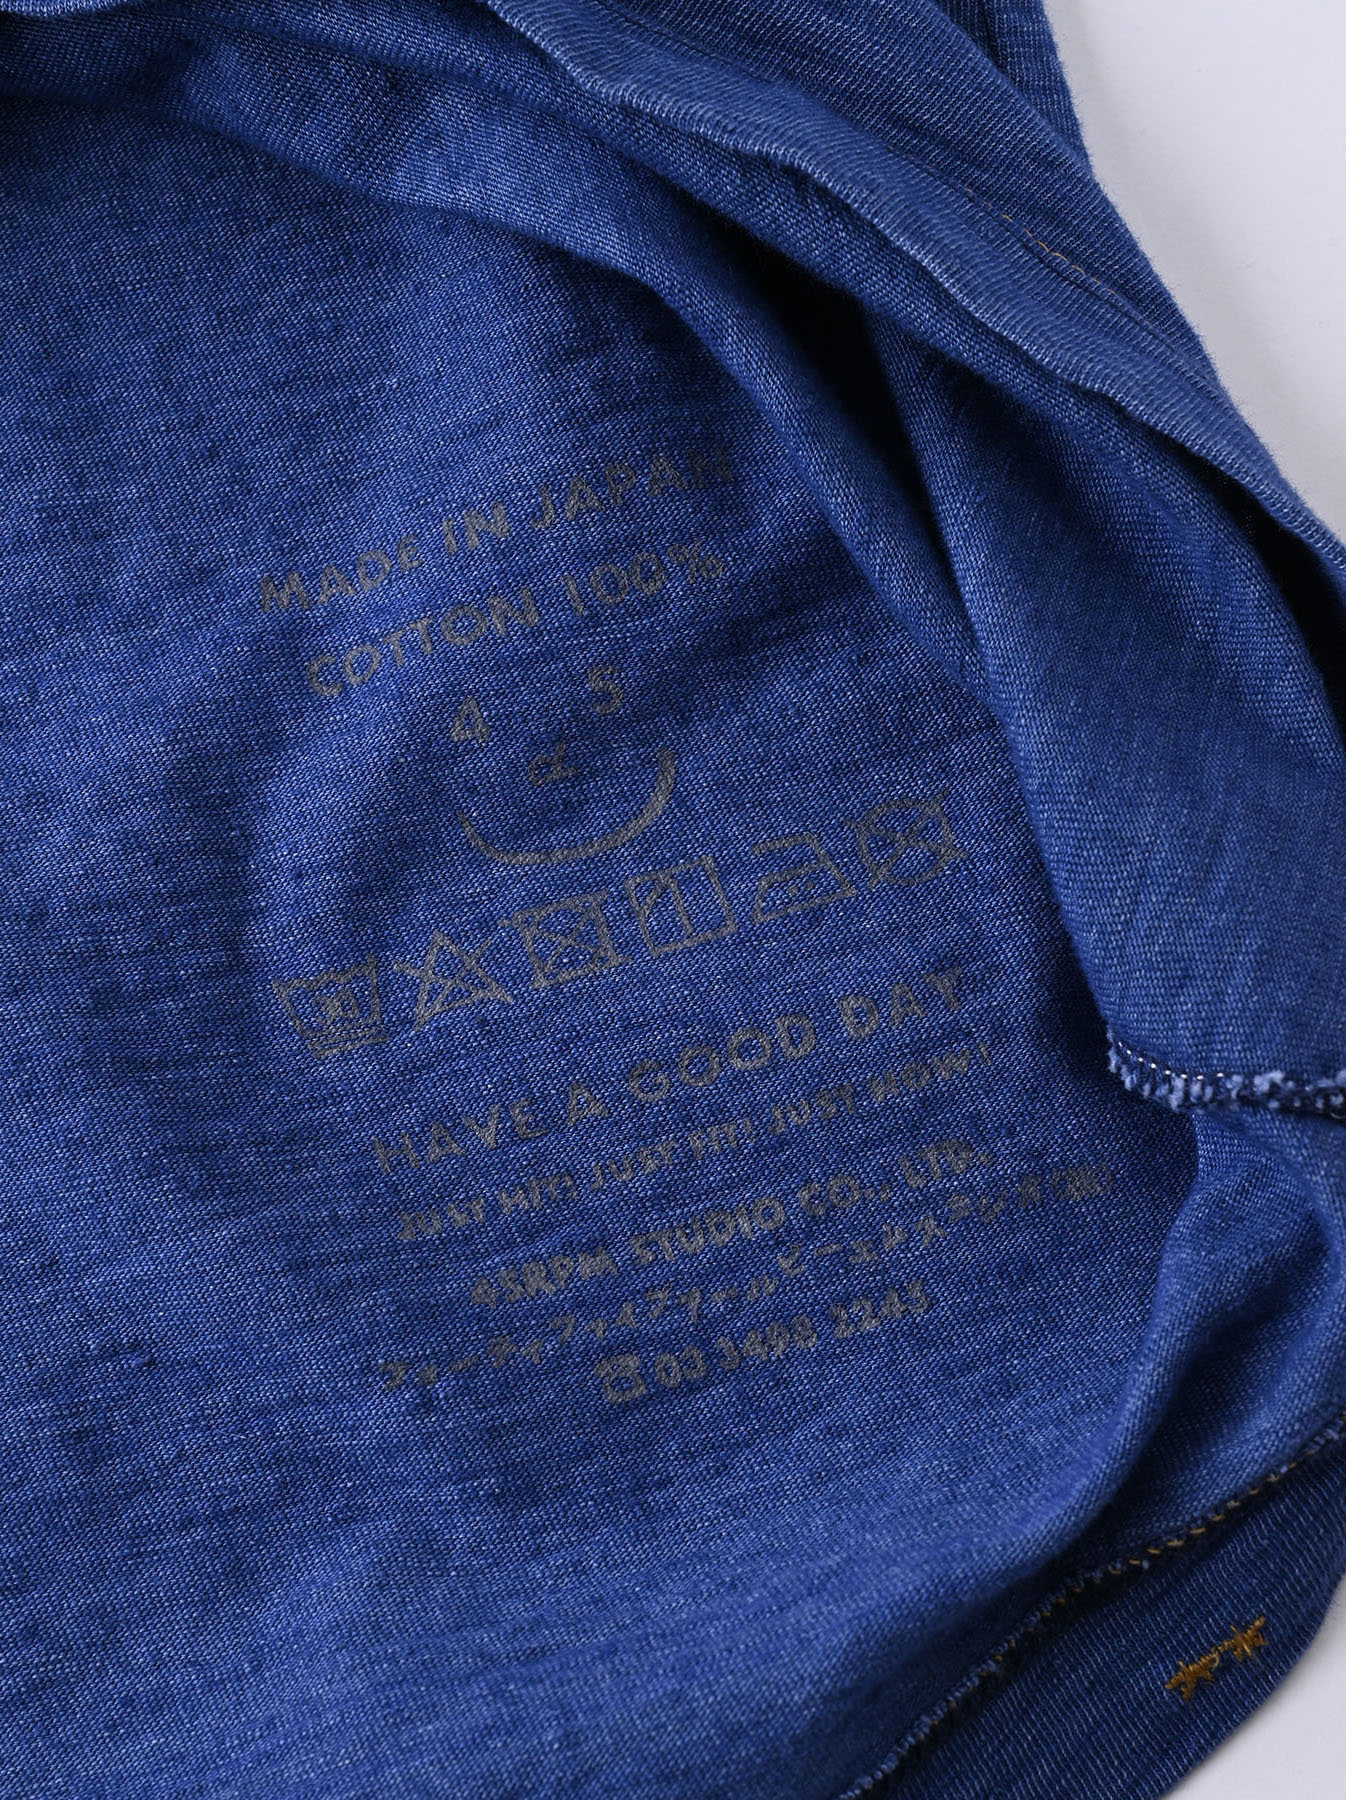 Indigo Tenjiku Lei Frill Ocean T-shirt (0621)-11